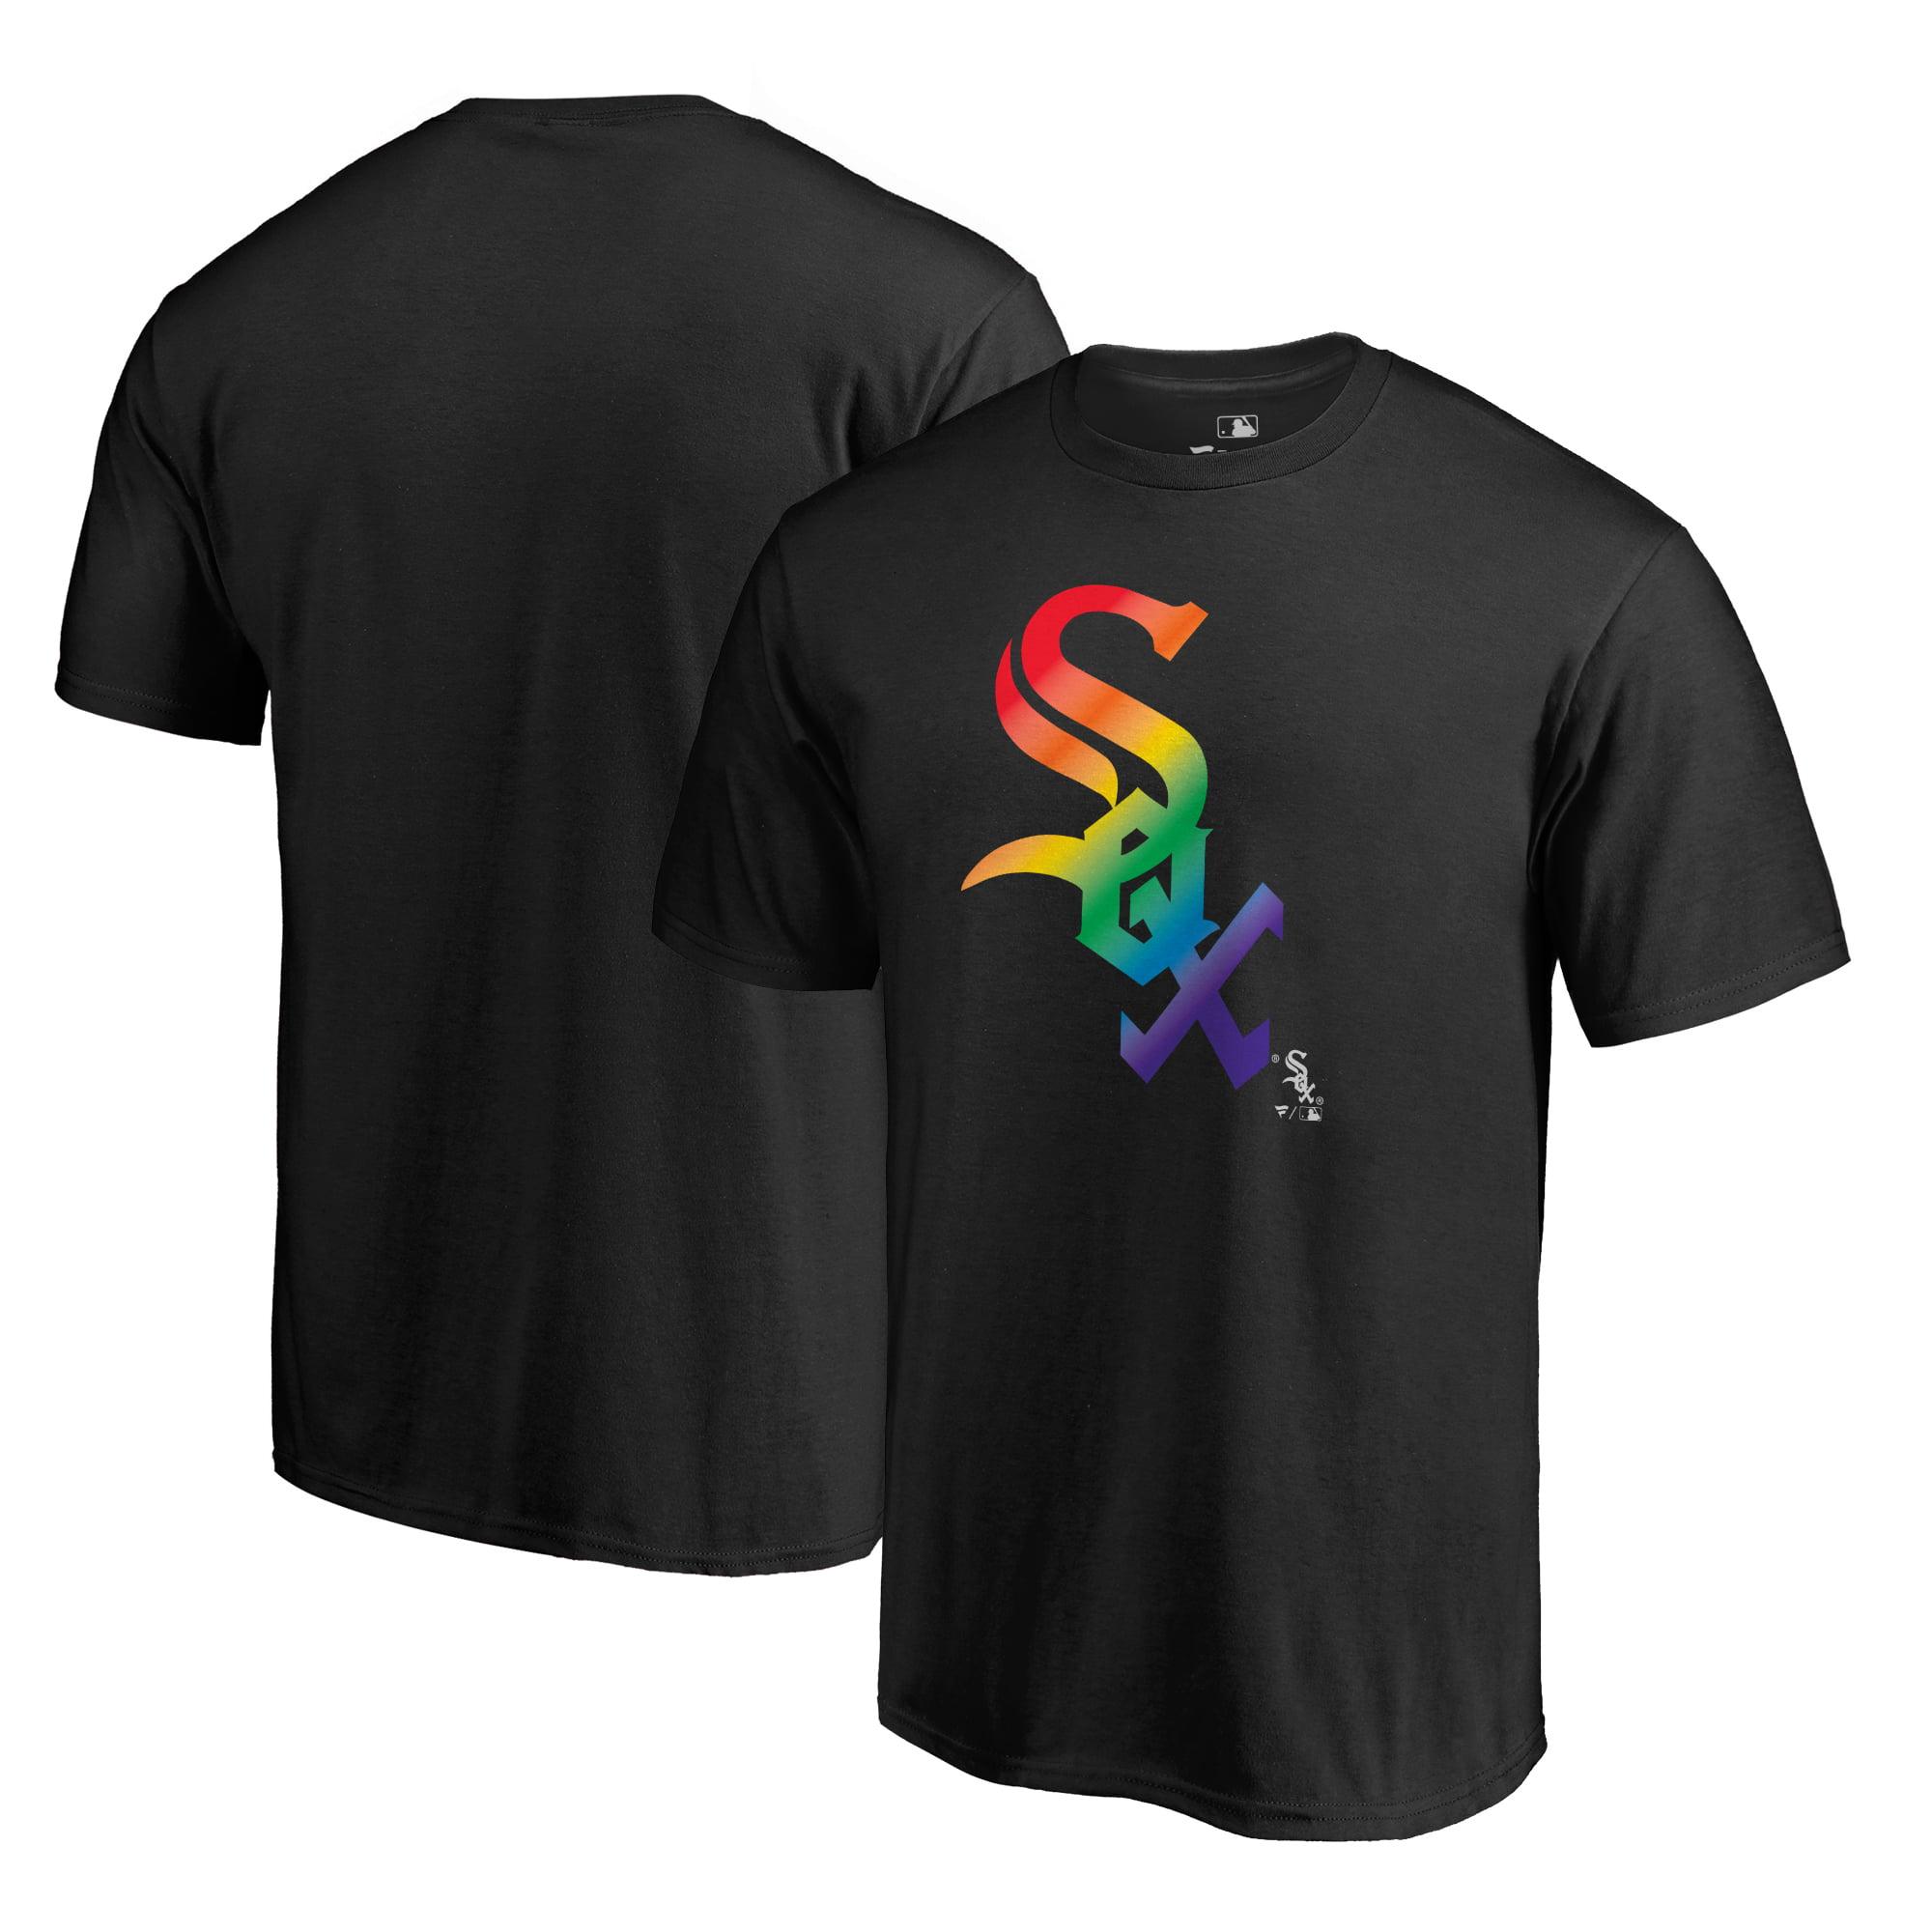 Chicago White Sox Fanatics Branded Pride T-Shirt - Black